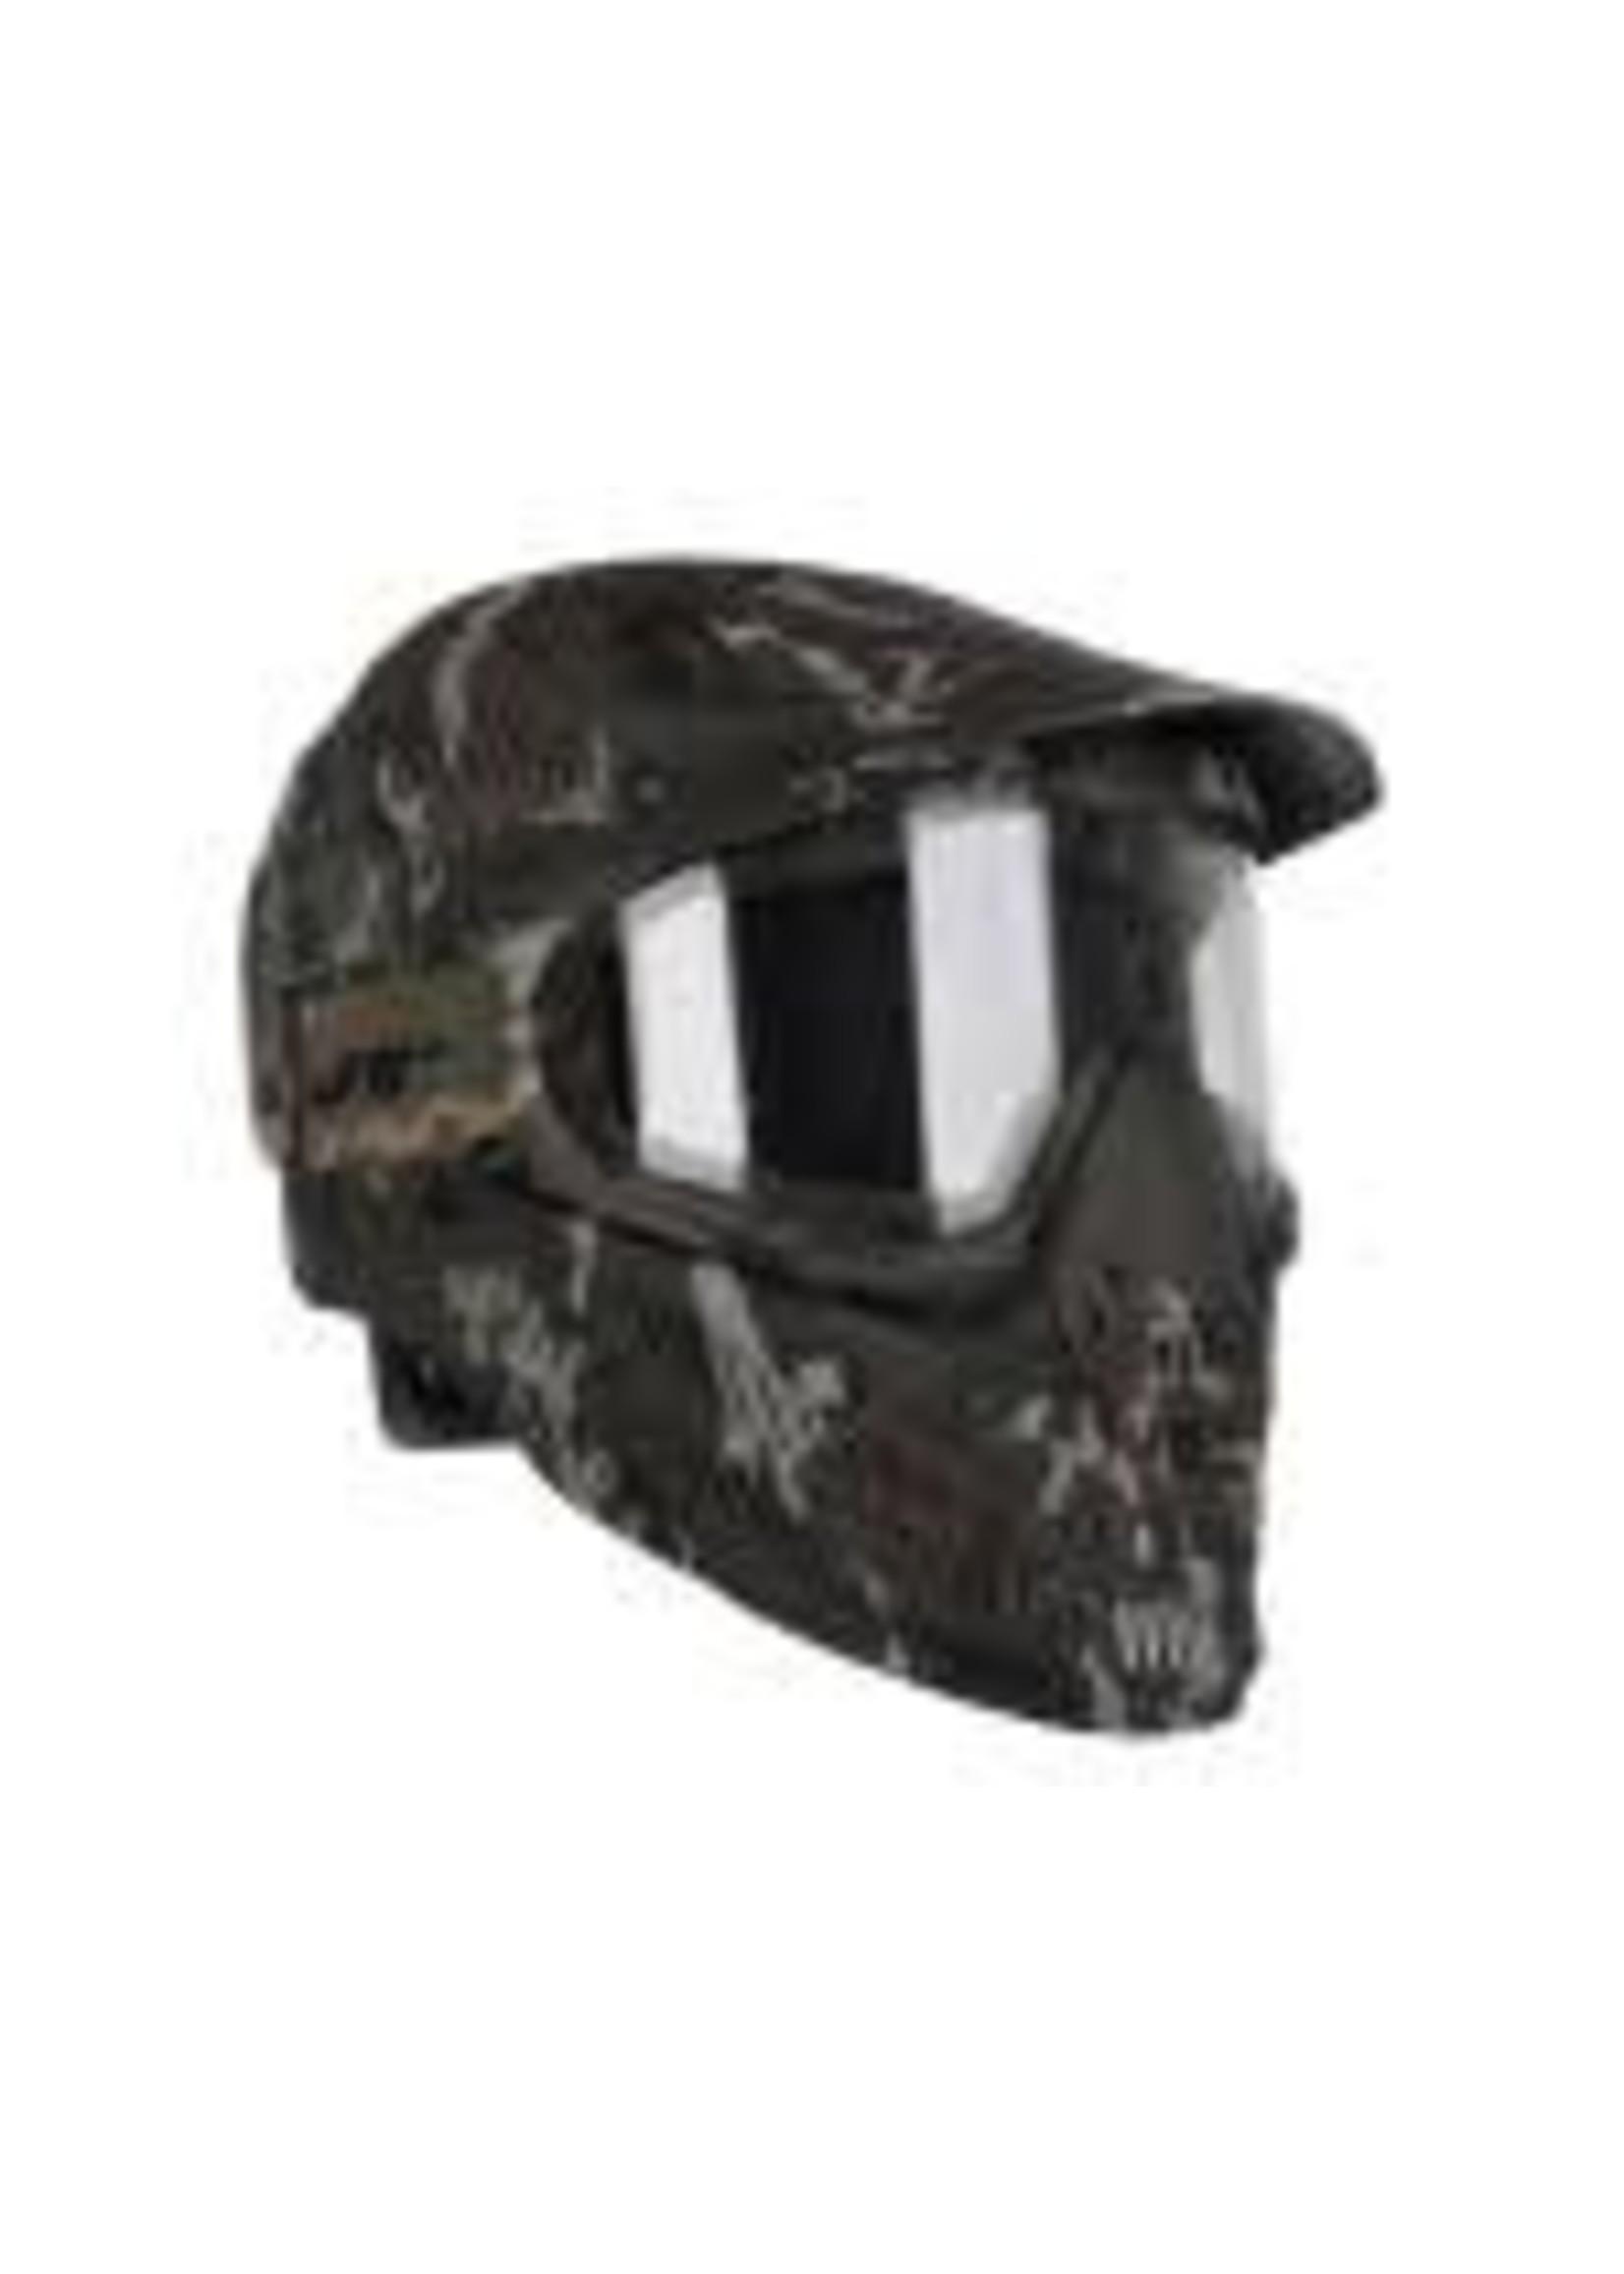 JT JT Spectra Flex 8 Thermal Full Coverage Goggle